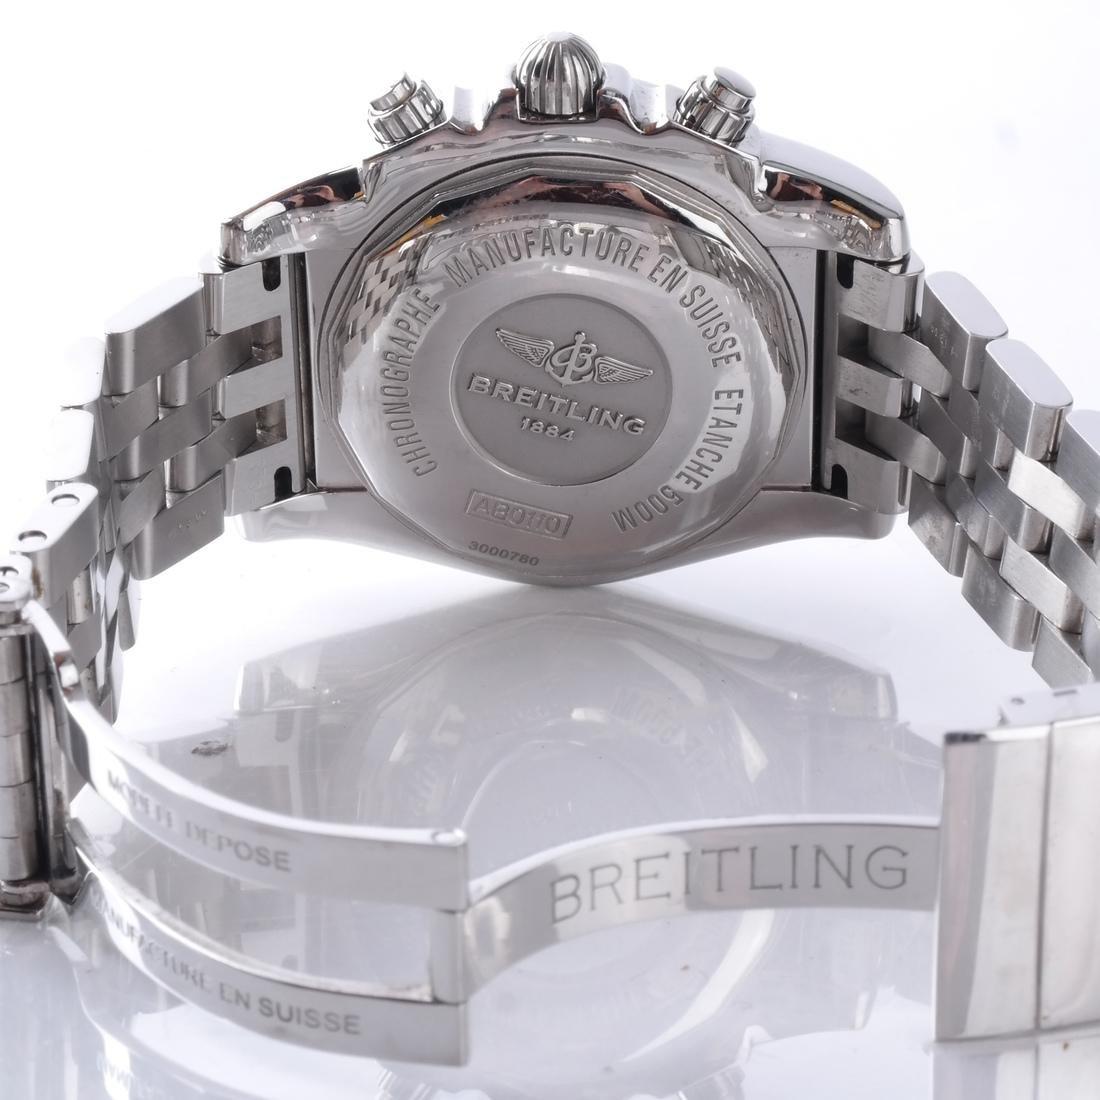 Breitling Chronomat AB0110 - 9